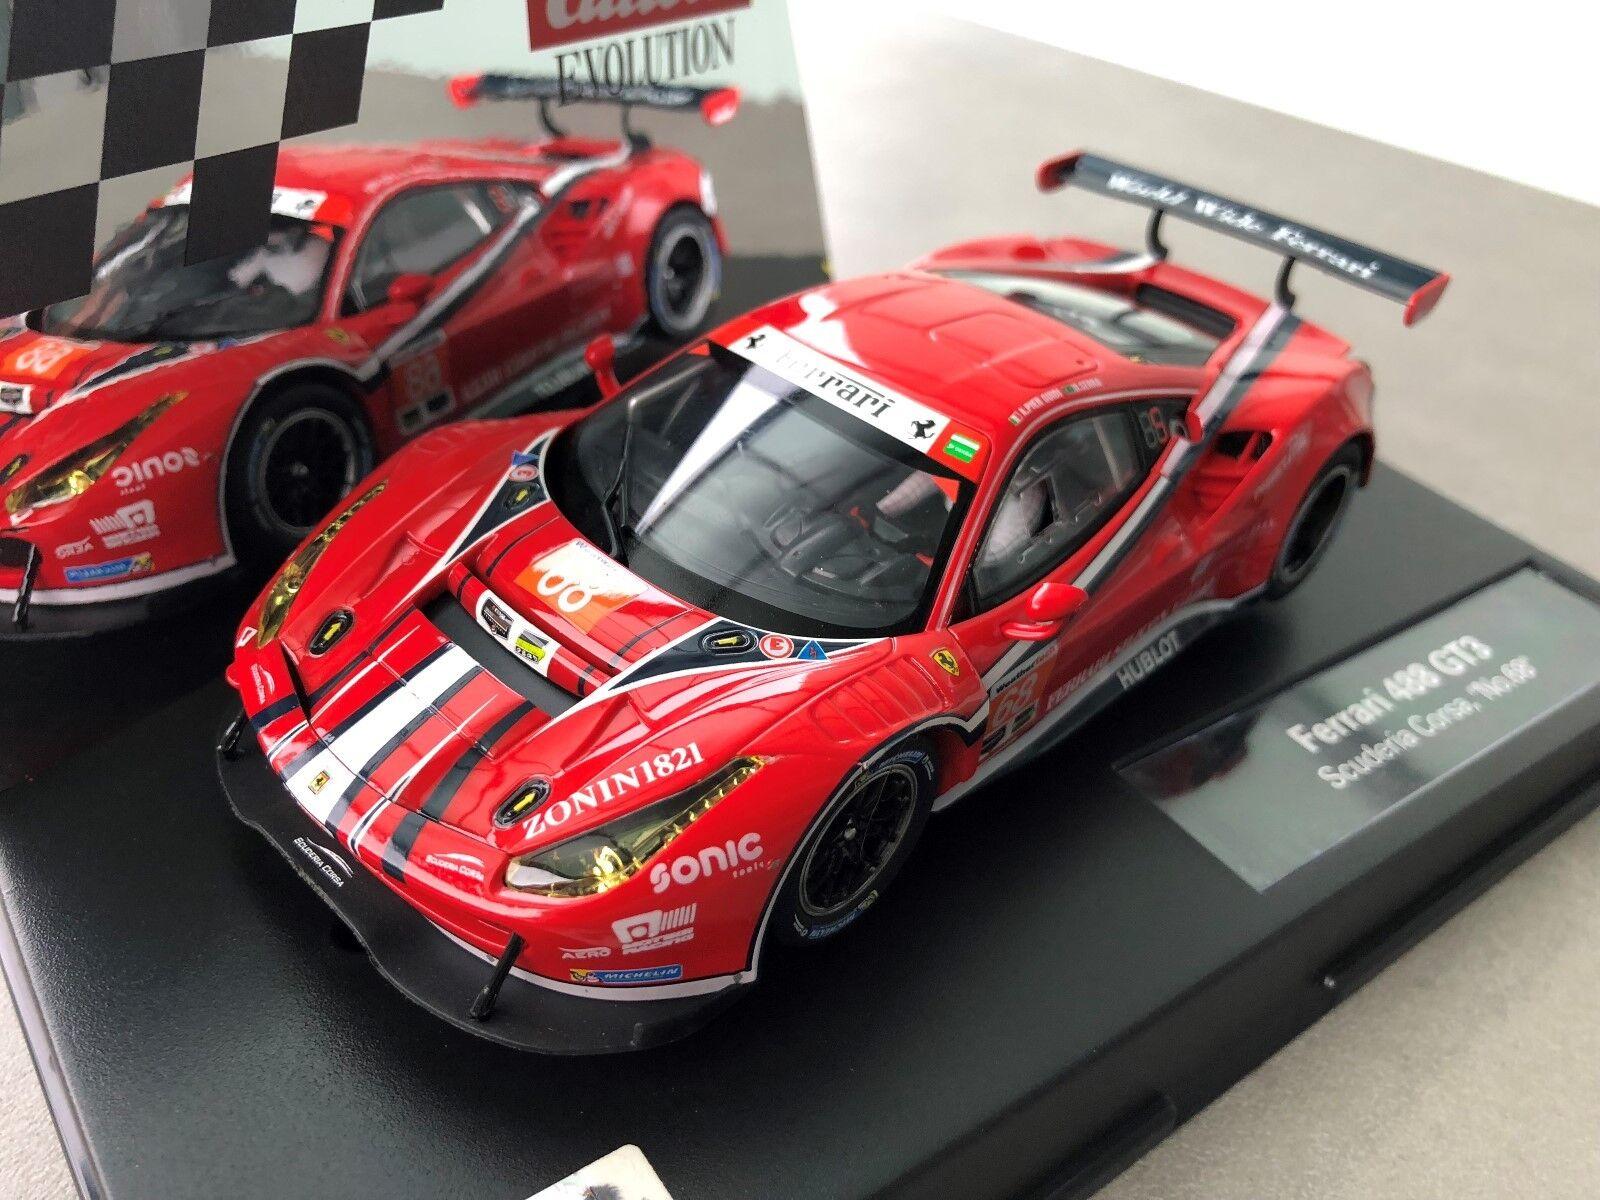 Carrera Evolution 27558 Ferrari GT3 Suderia Corsa,   no. 86   New Sealed Box